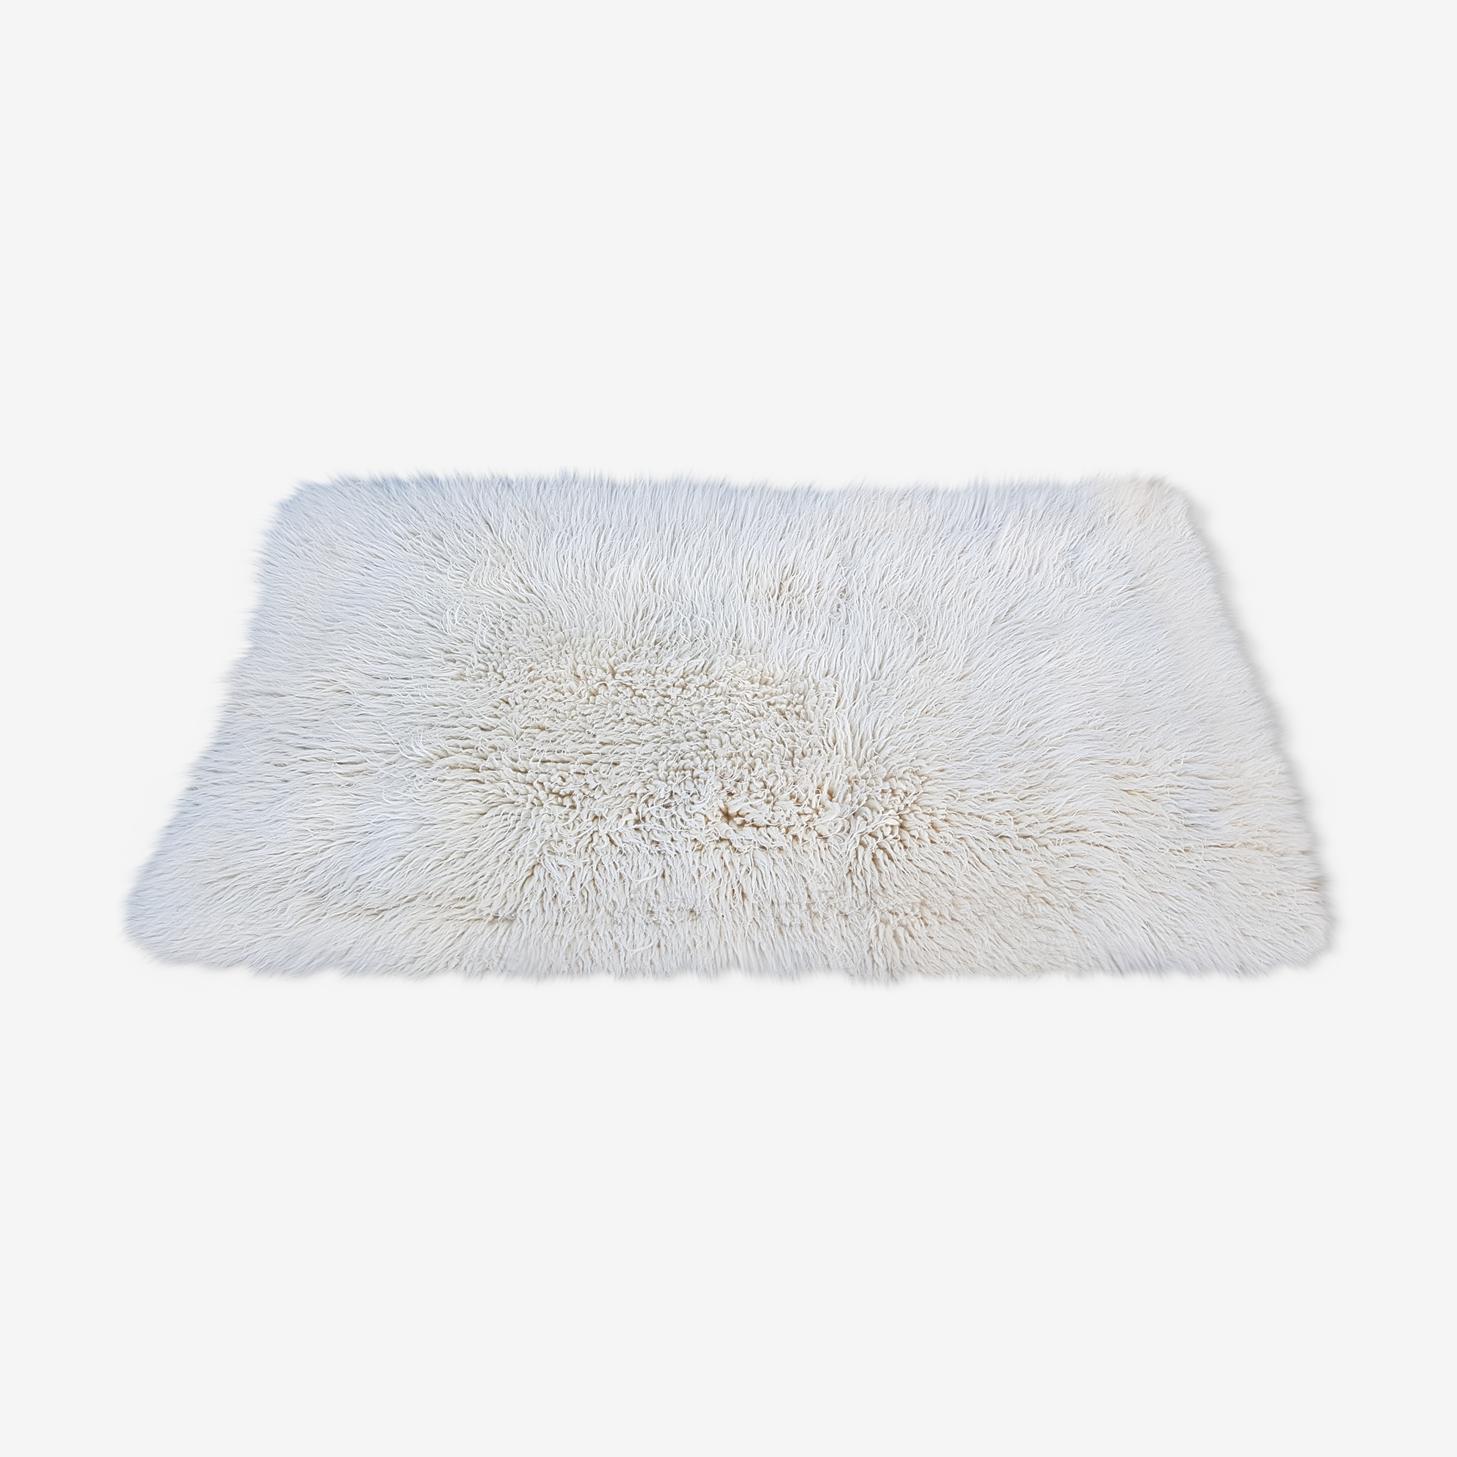 Sheepskin rug 130x70cm